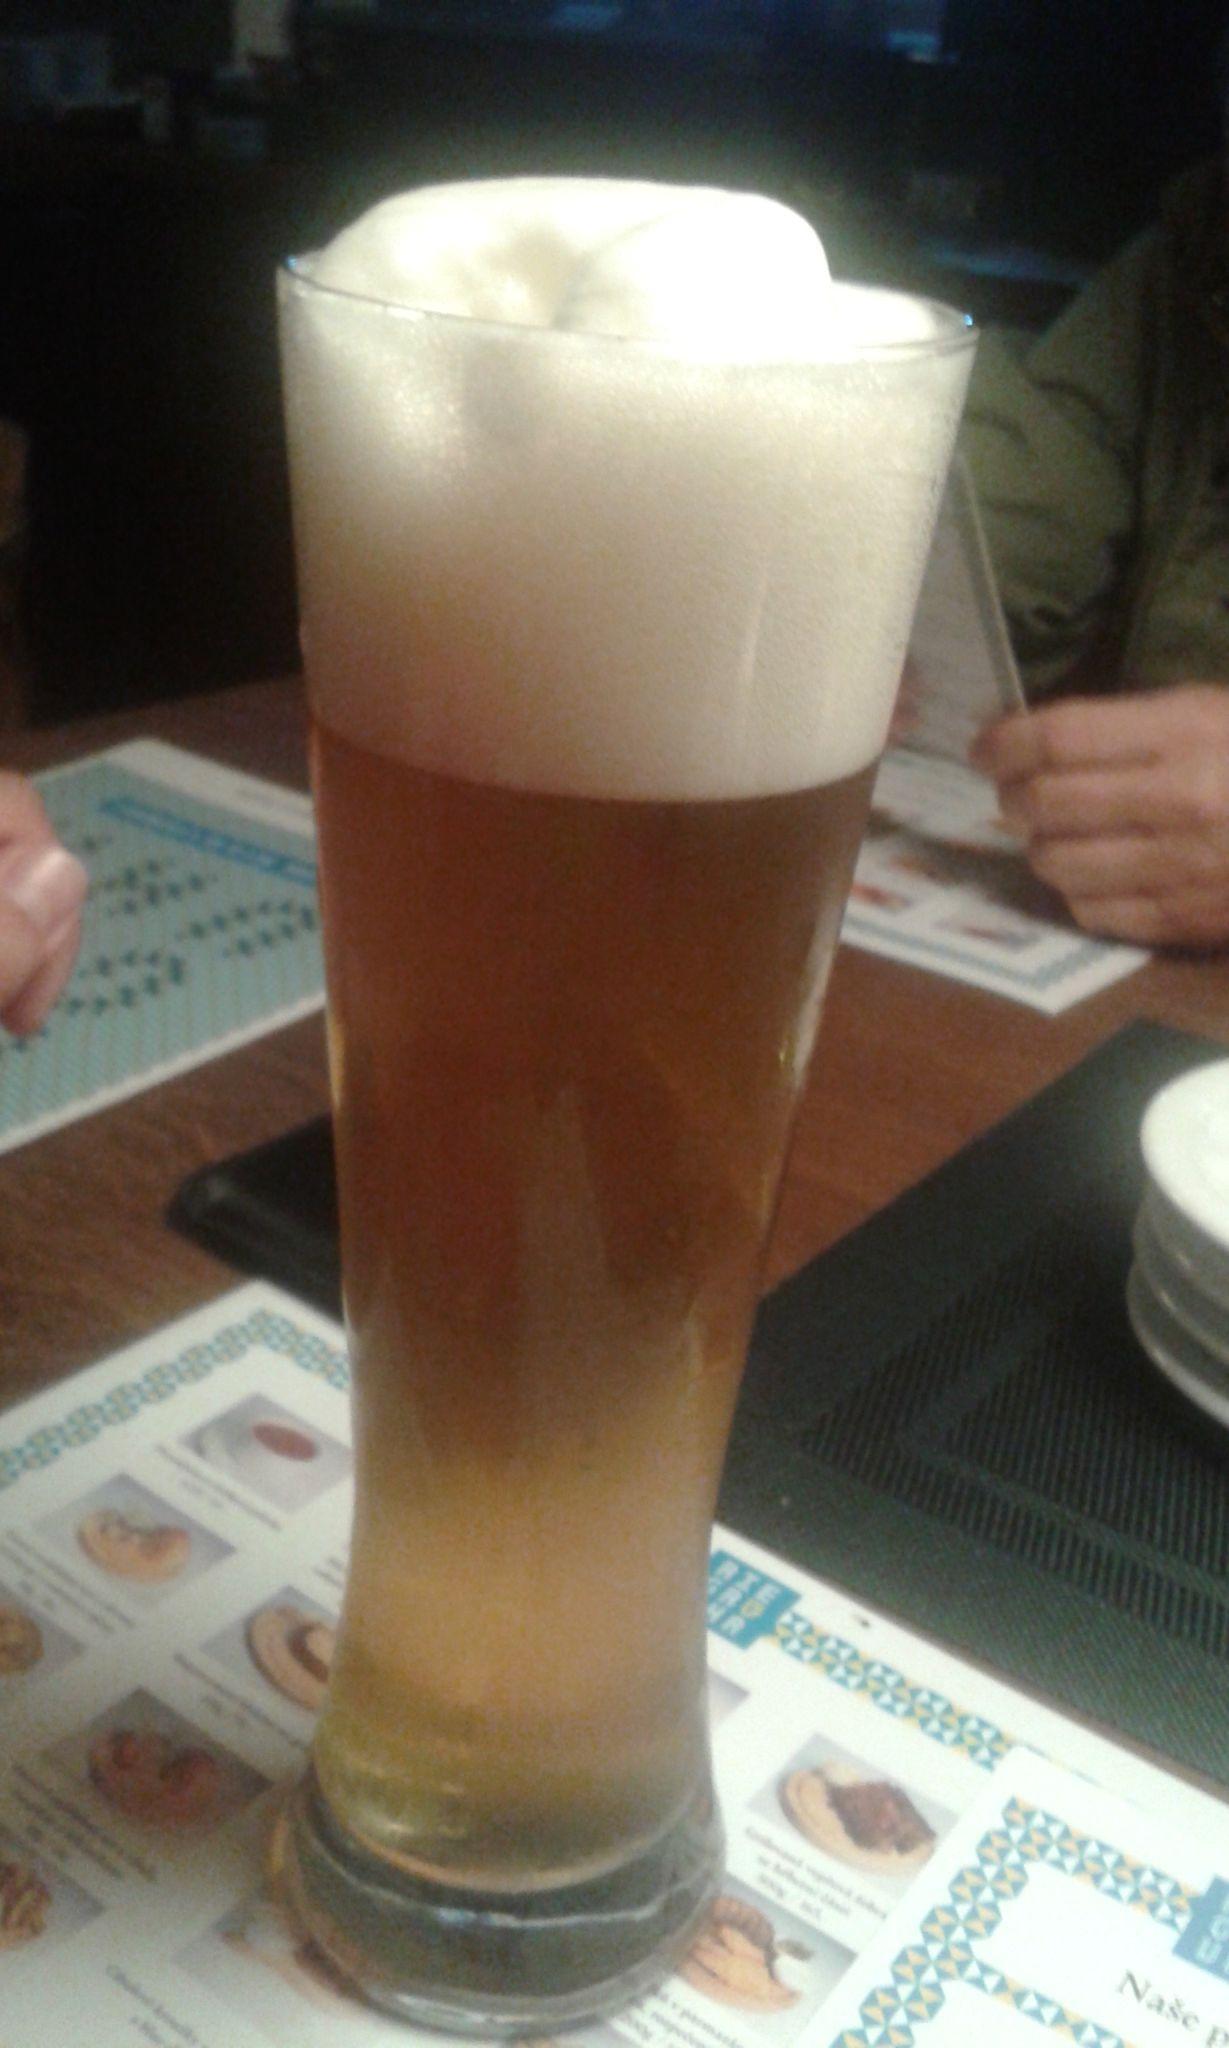 Riegrovka American Wheat Ale